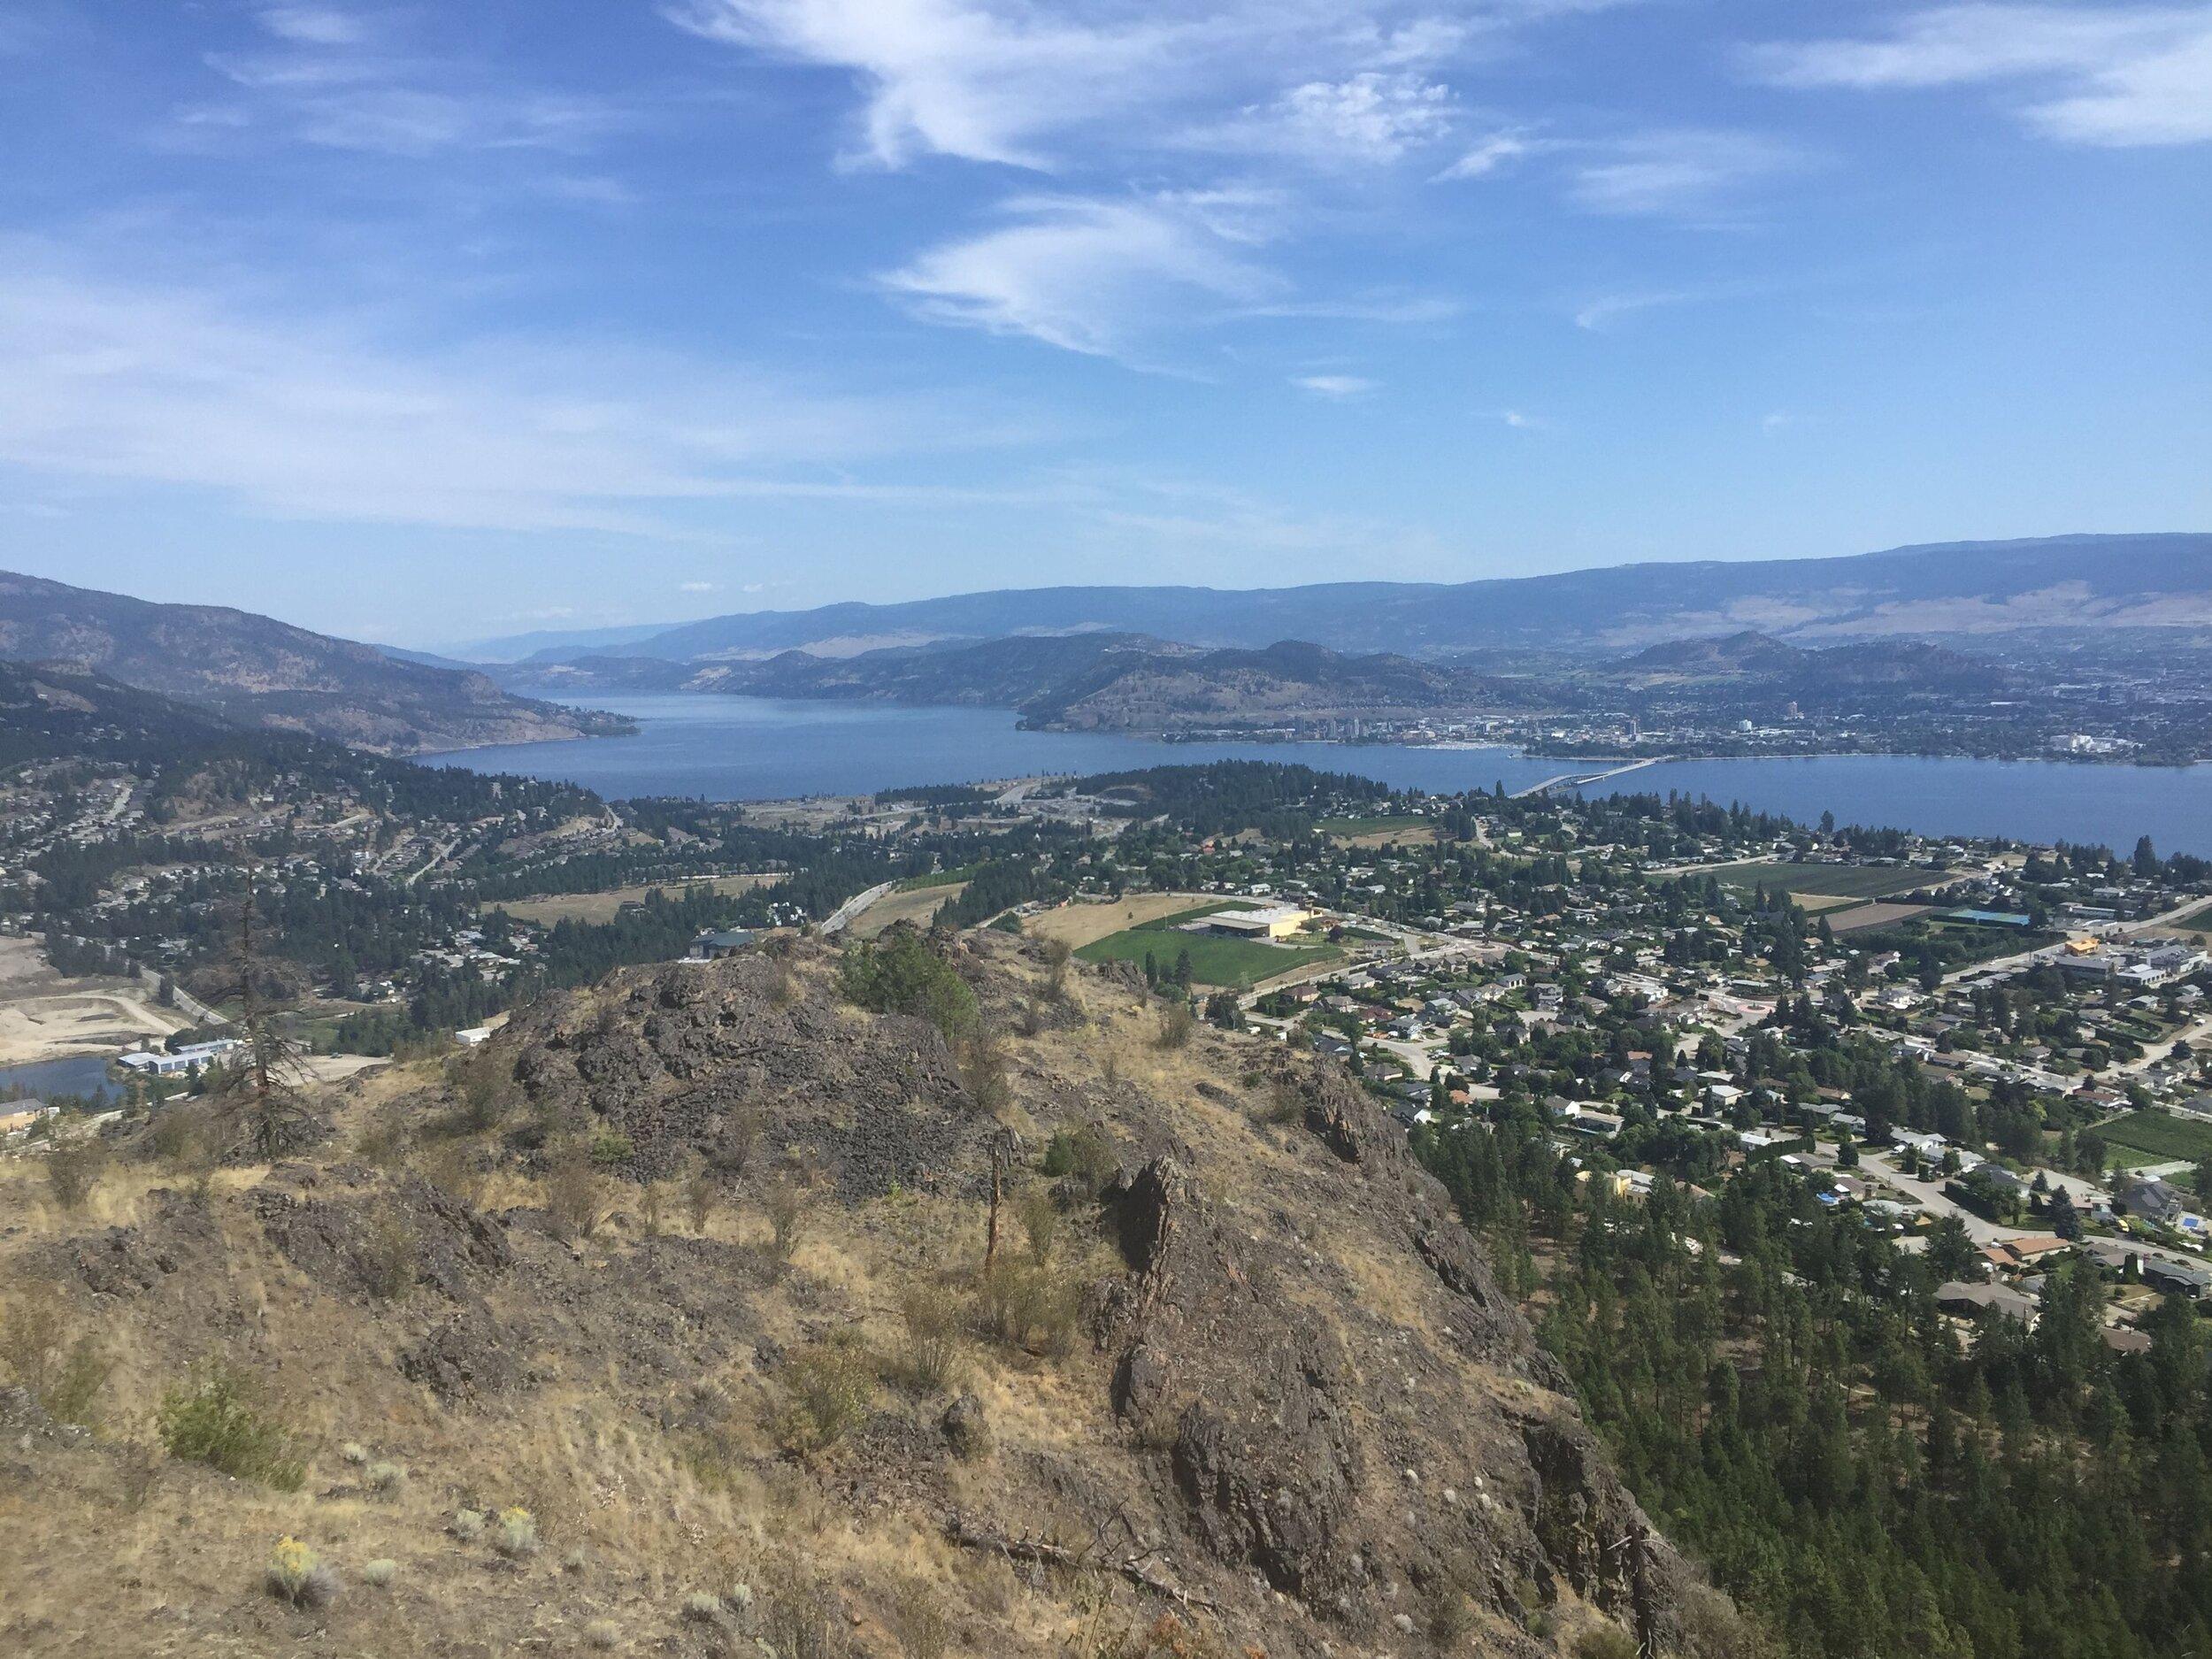 Mt. Bouchrie, Kelowna, British Columbia, Canada